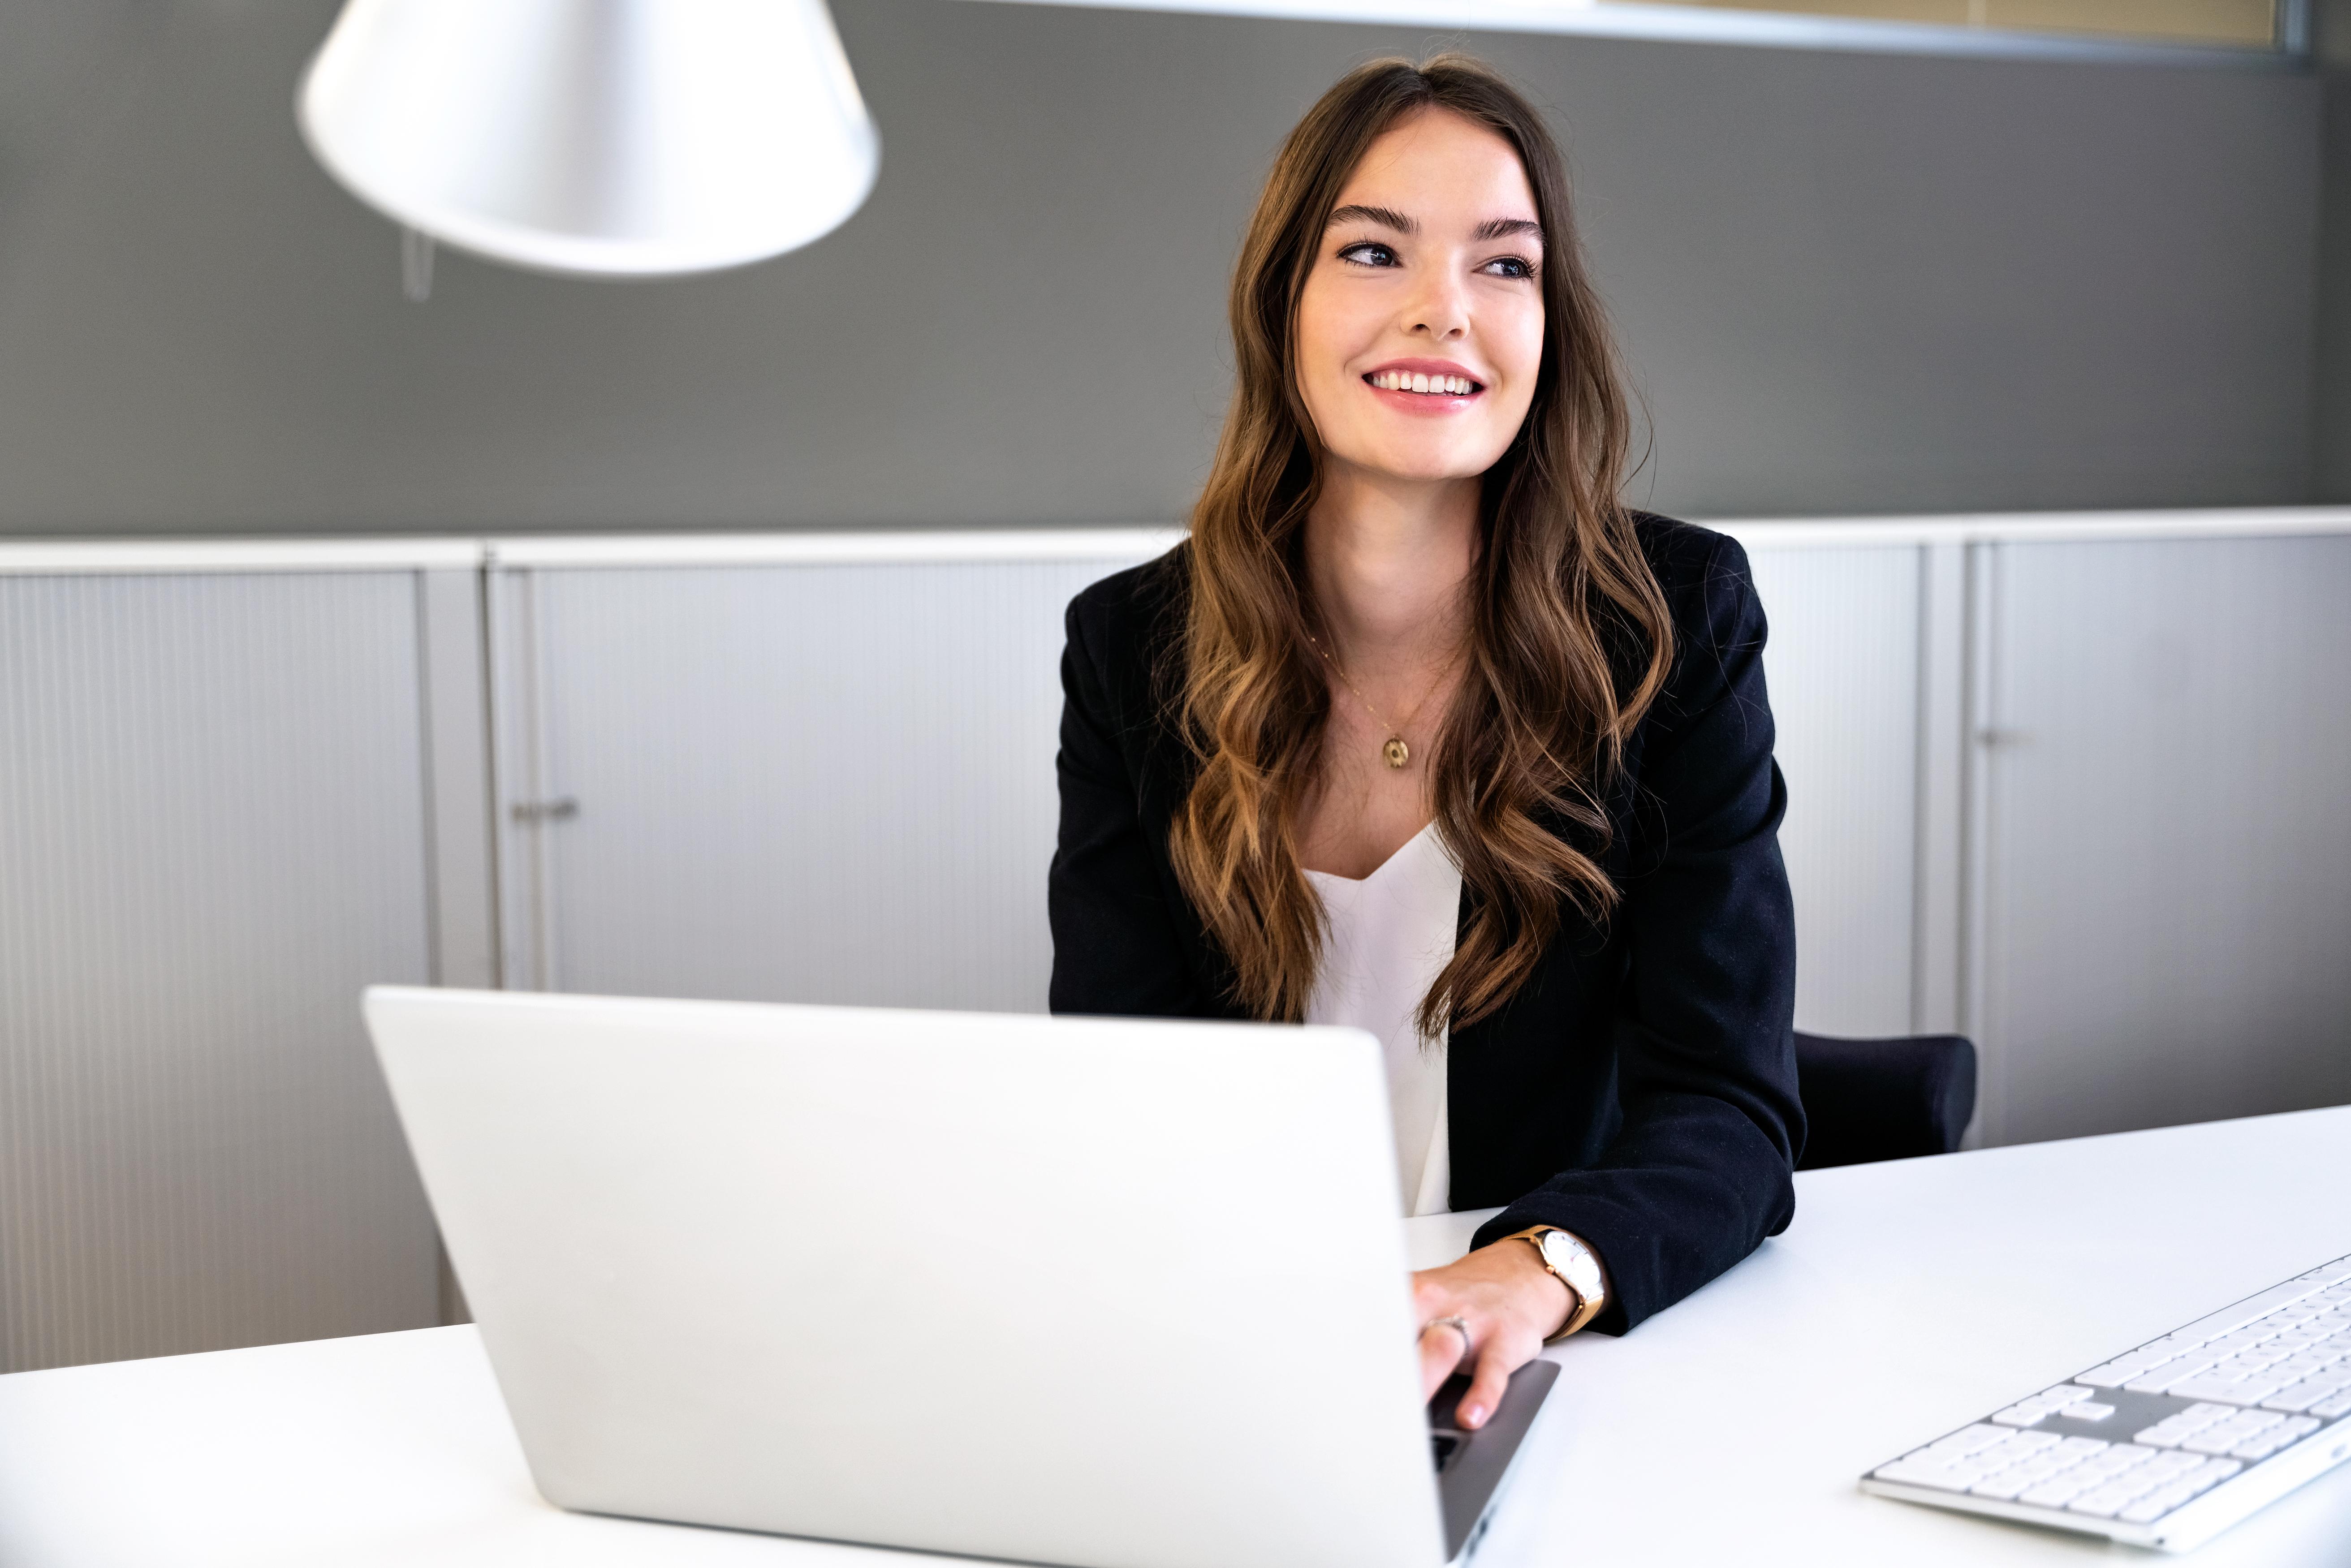 schönes business make up junge Frau